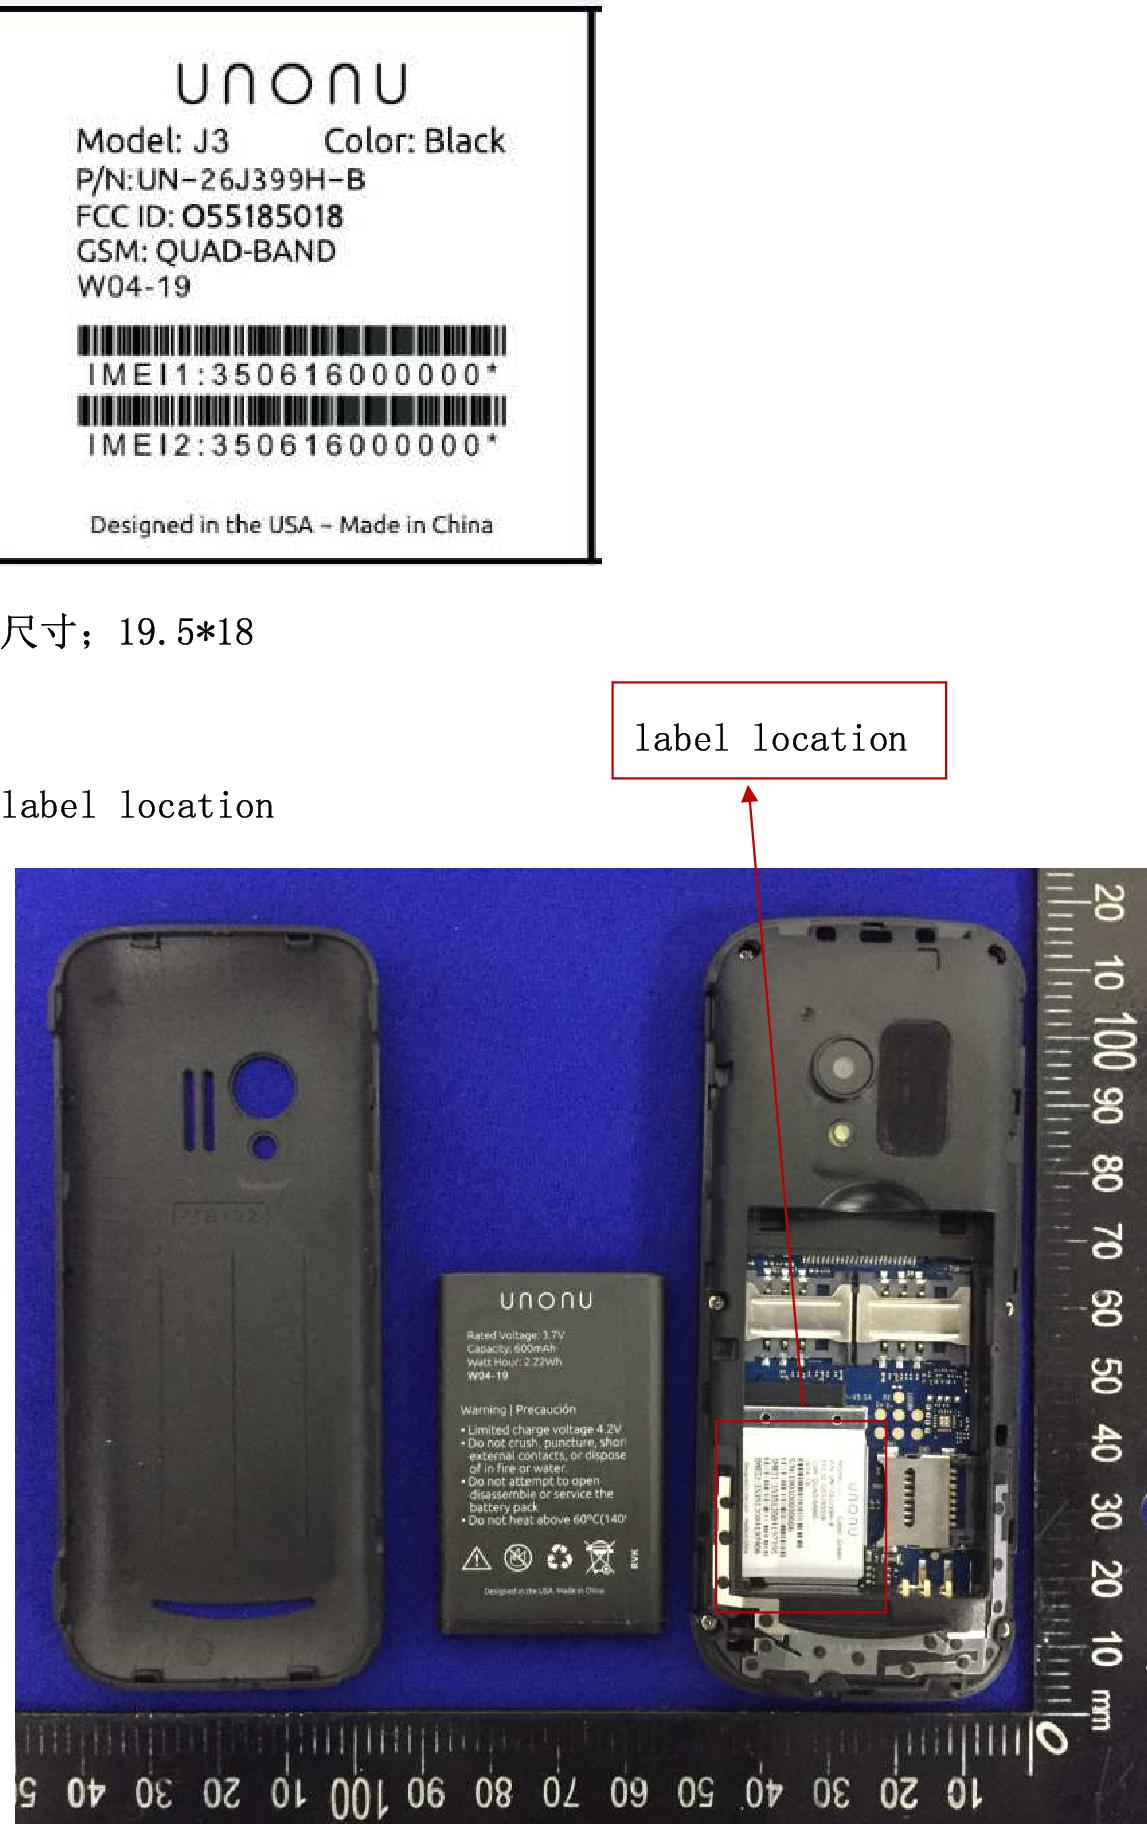 Swagtek 1 8 Inch 2g Bar Phone 185018  O55185018   Fcc